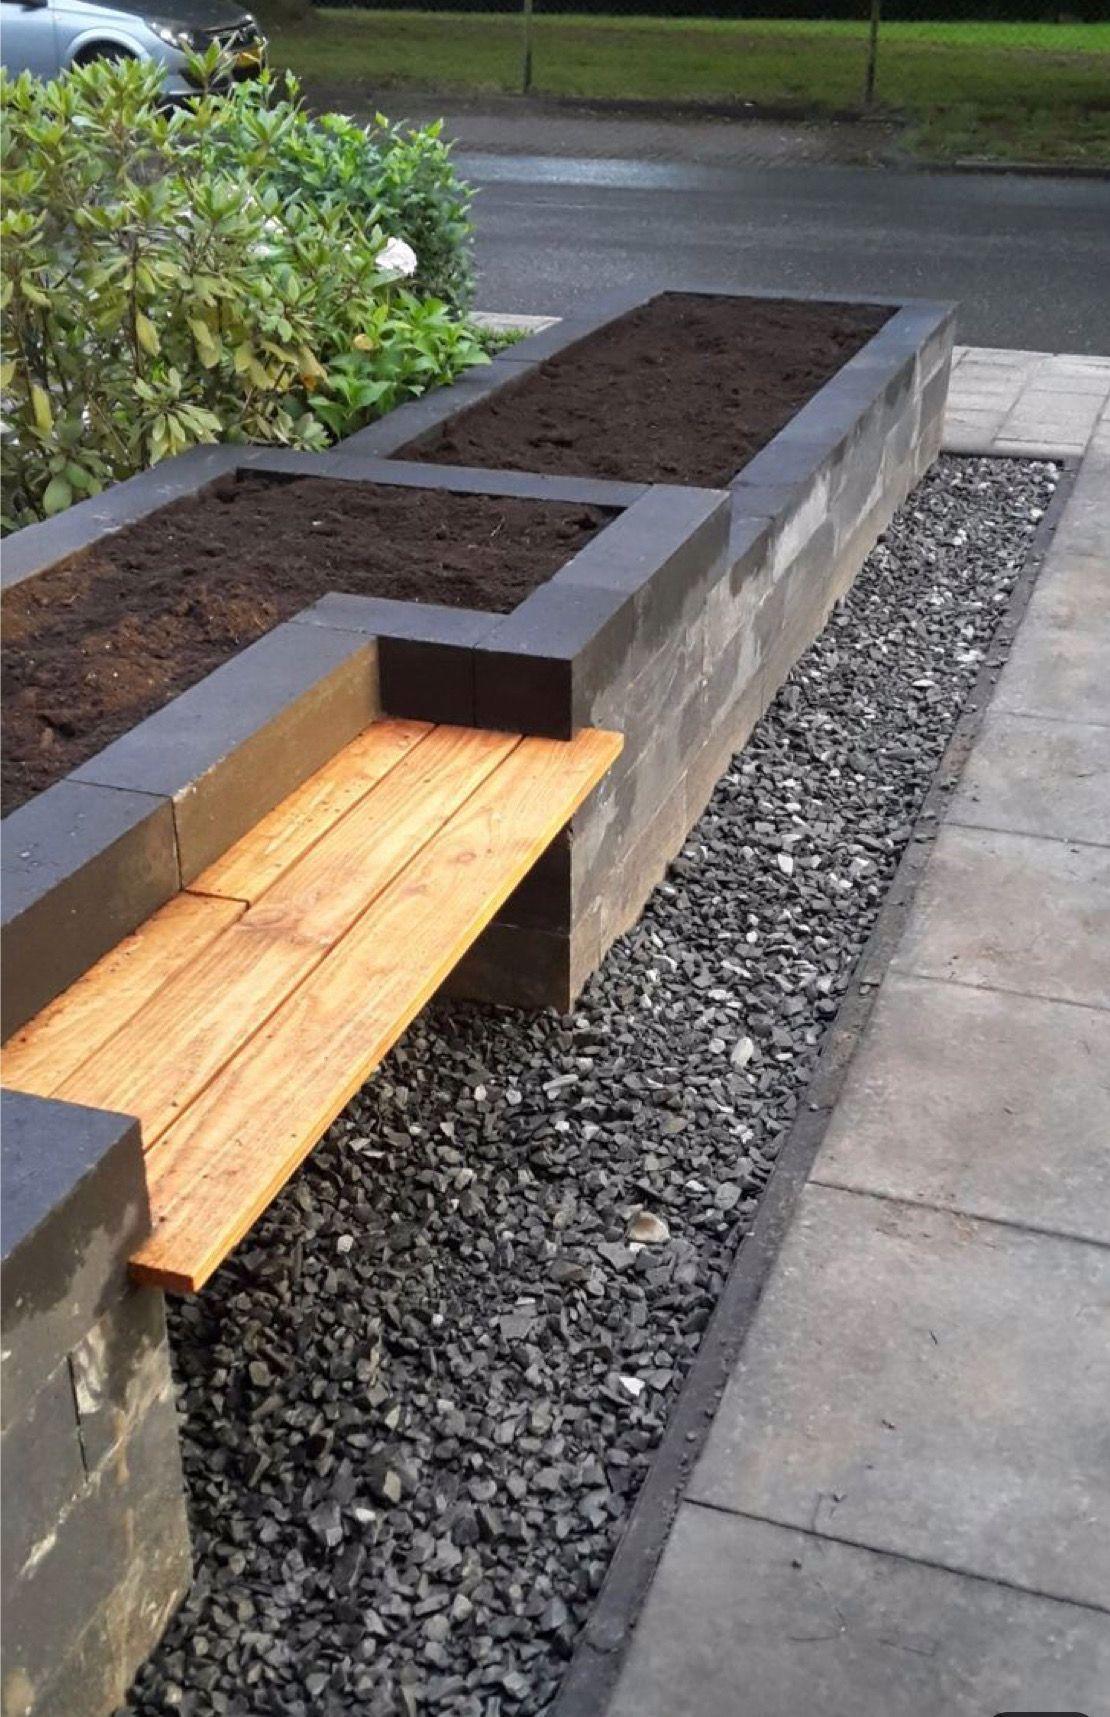 Hochbeet Mit Bank Erhohtegartenbeete Hochbeet Mit Bank In 2020 Backyard Landscaping Designs Backyard Garden Seating